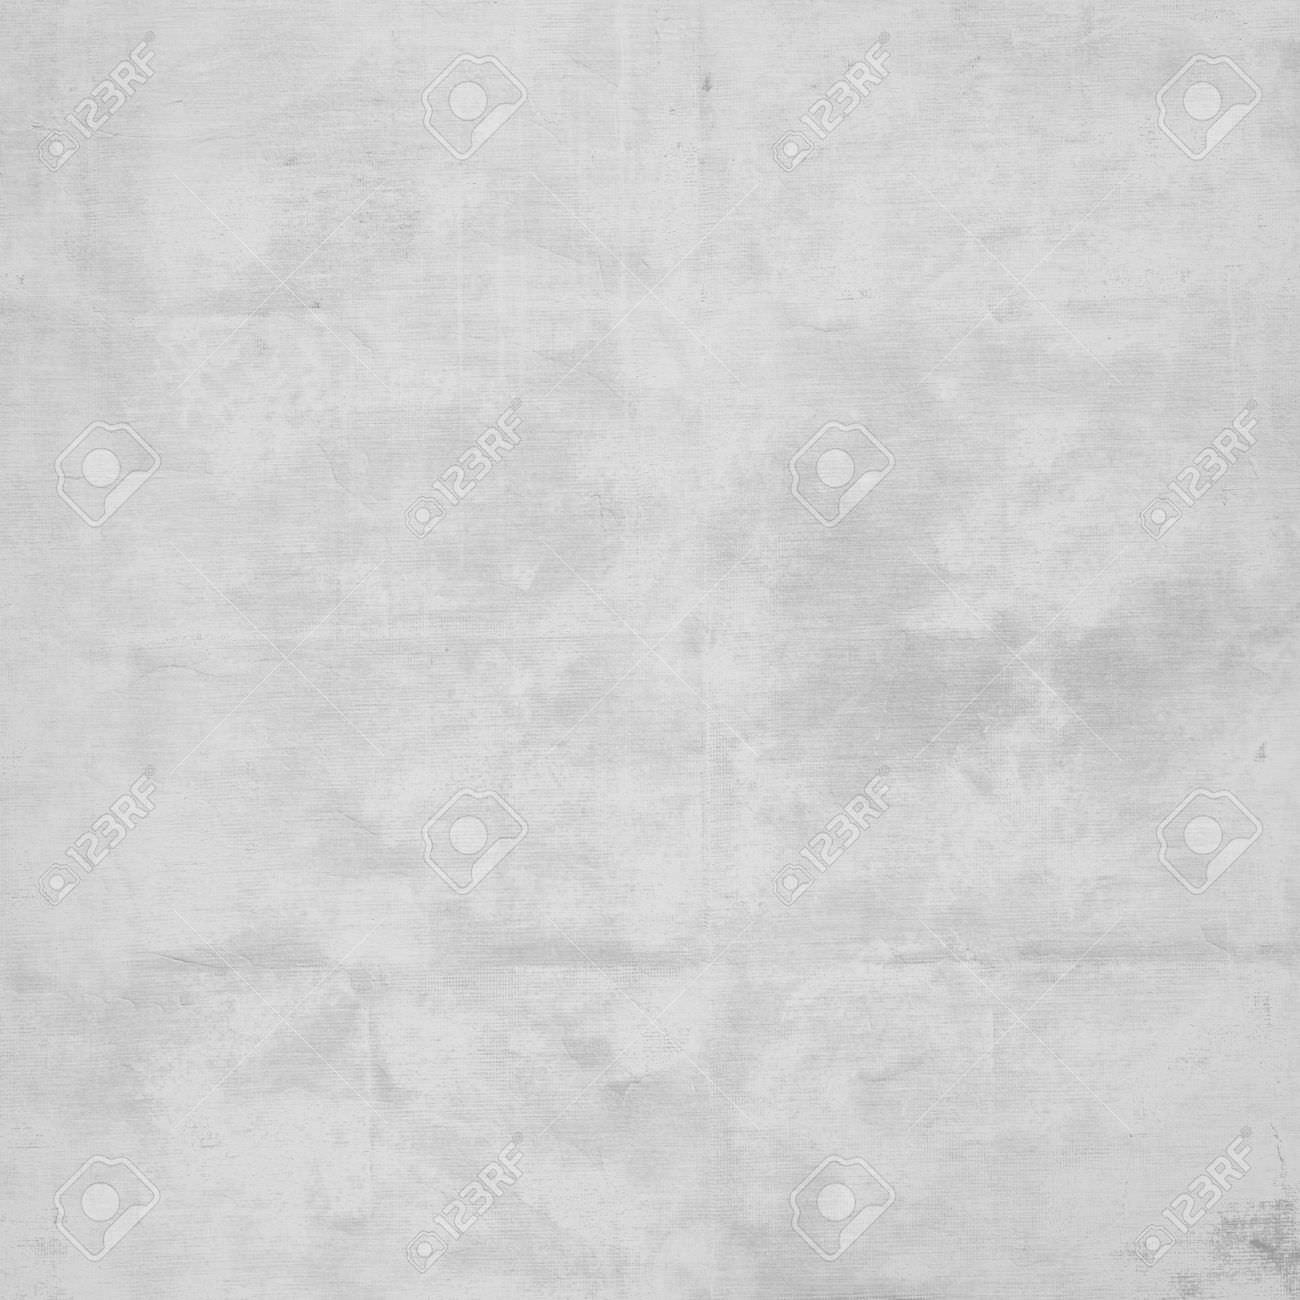 29 white hd - photo #21